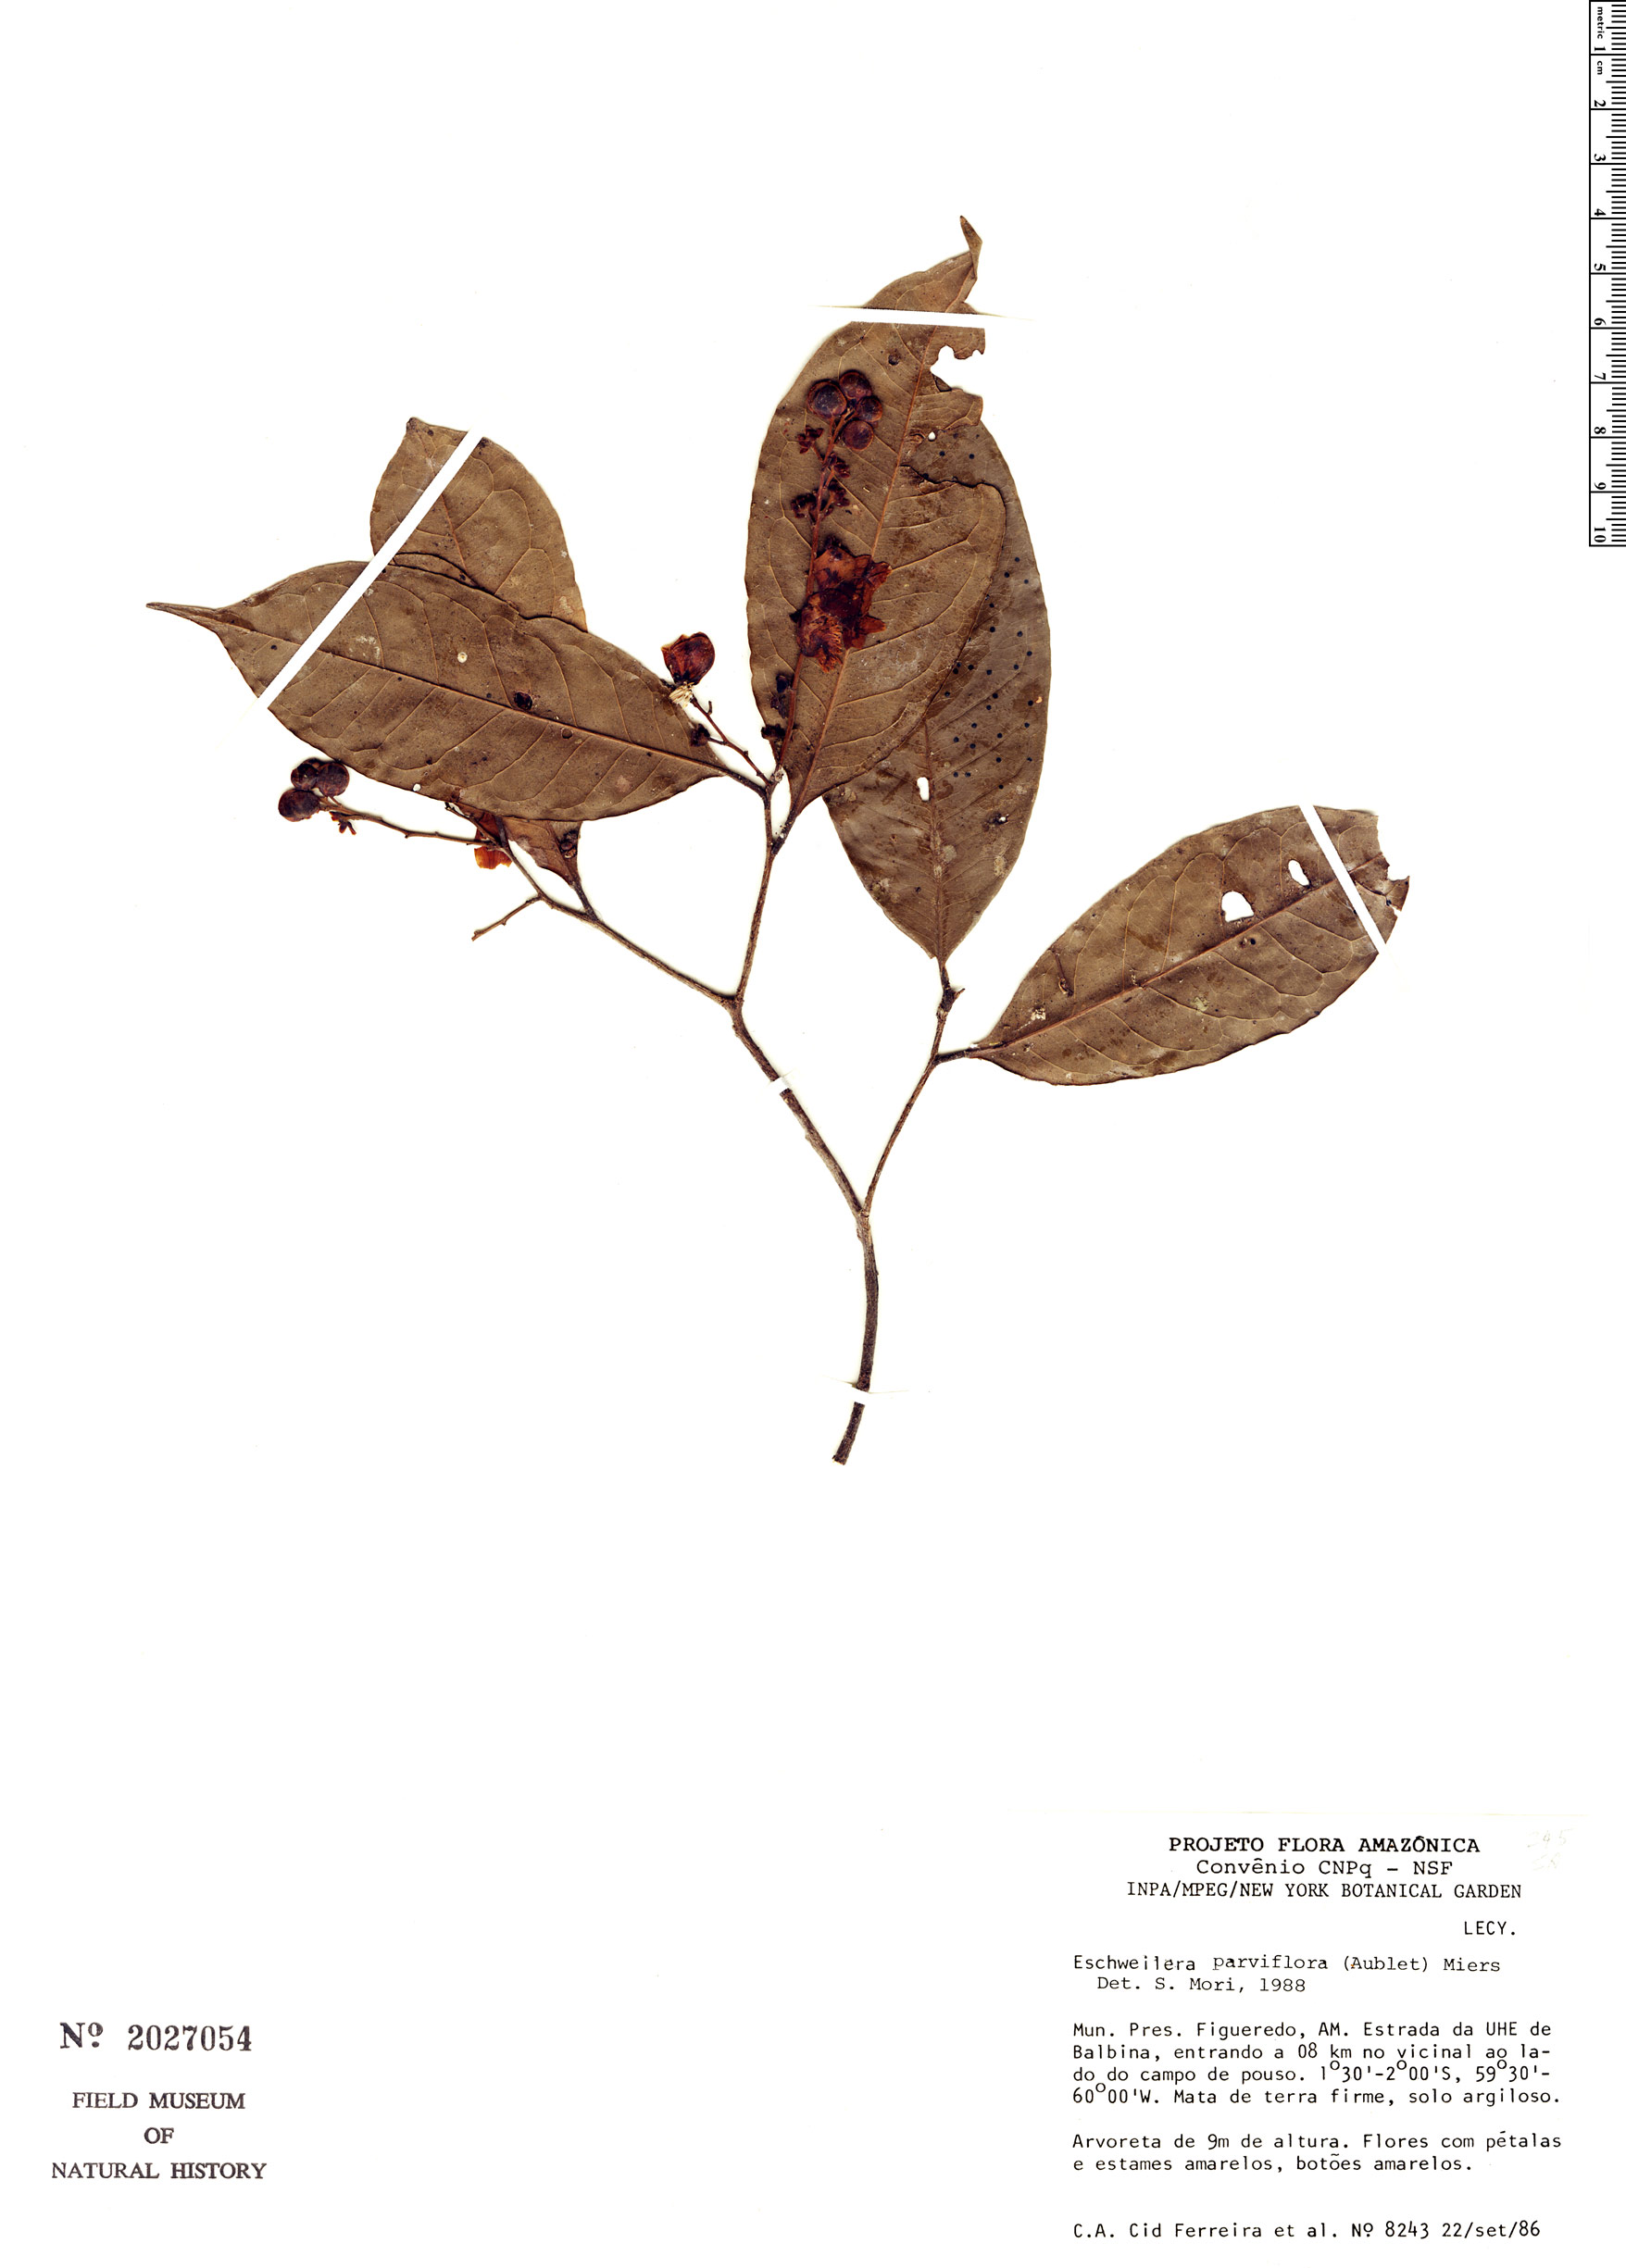 Specimen: Eschweilera parviflora